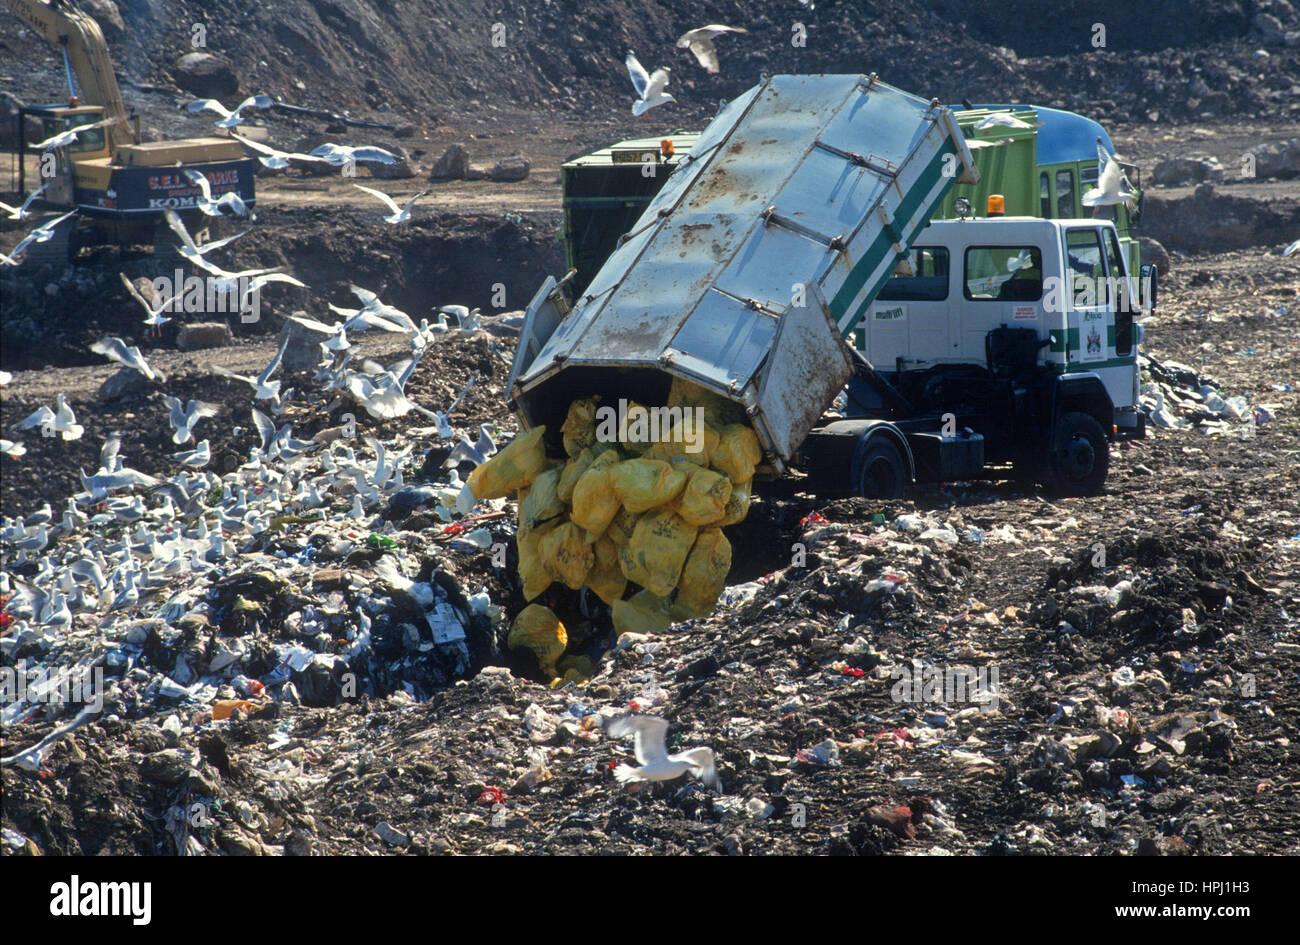 Landfill Site, UK - Stock Image